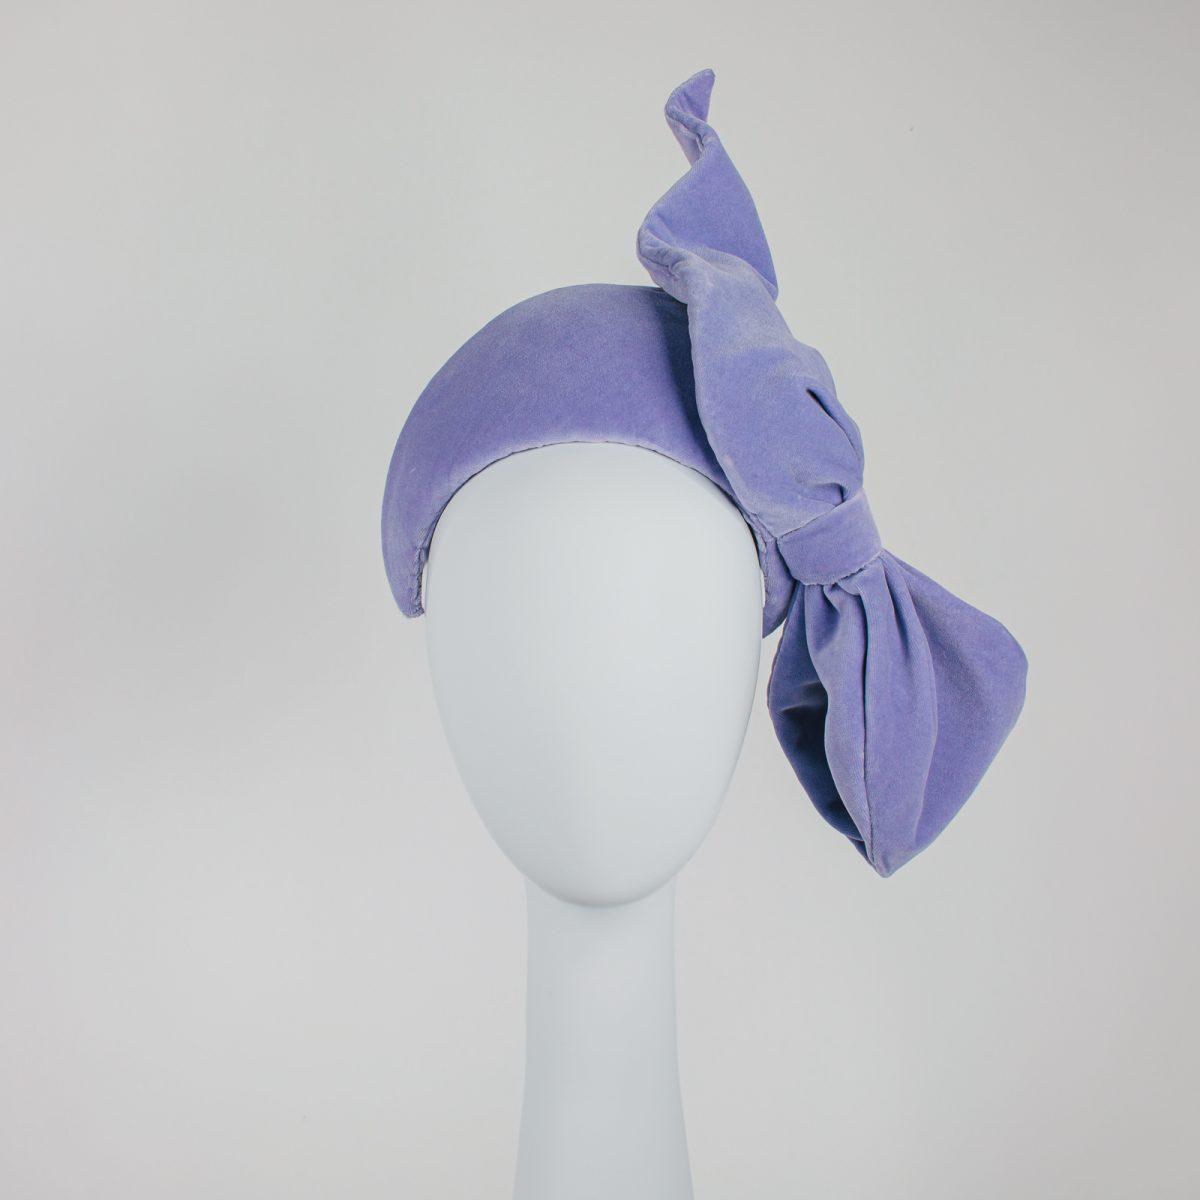 velvet crown with bow - Melbourne unique millinery